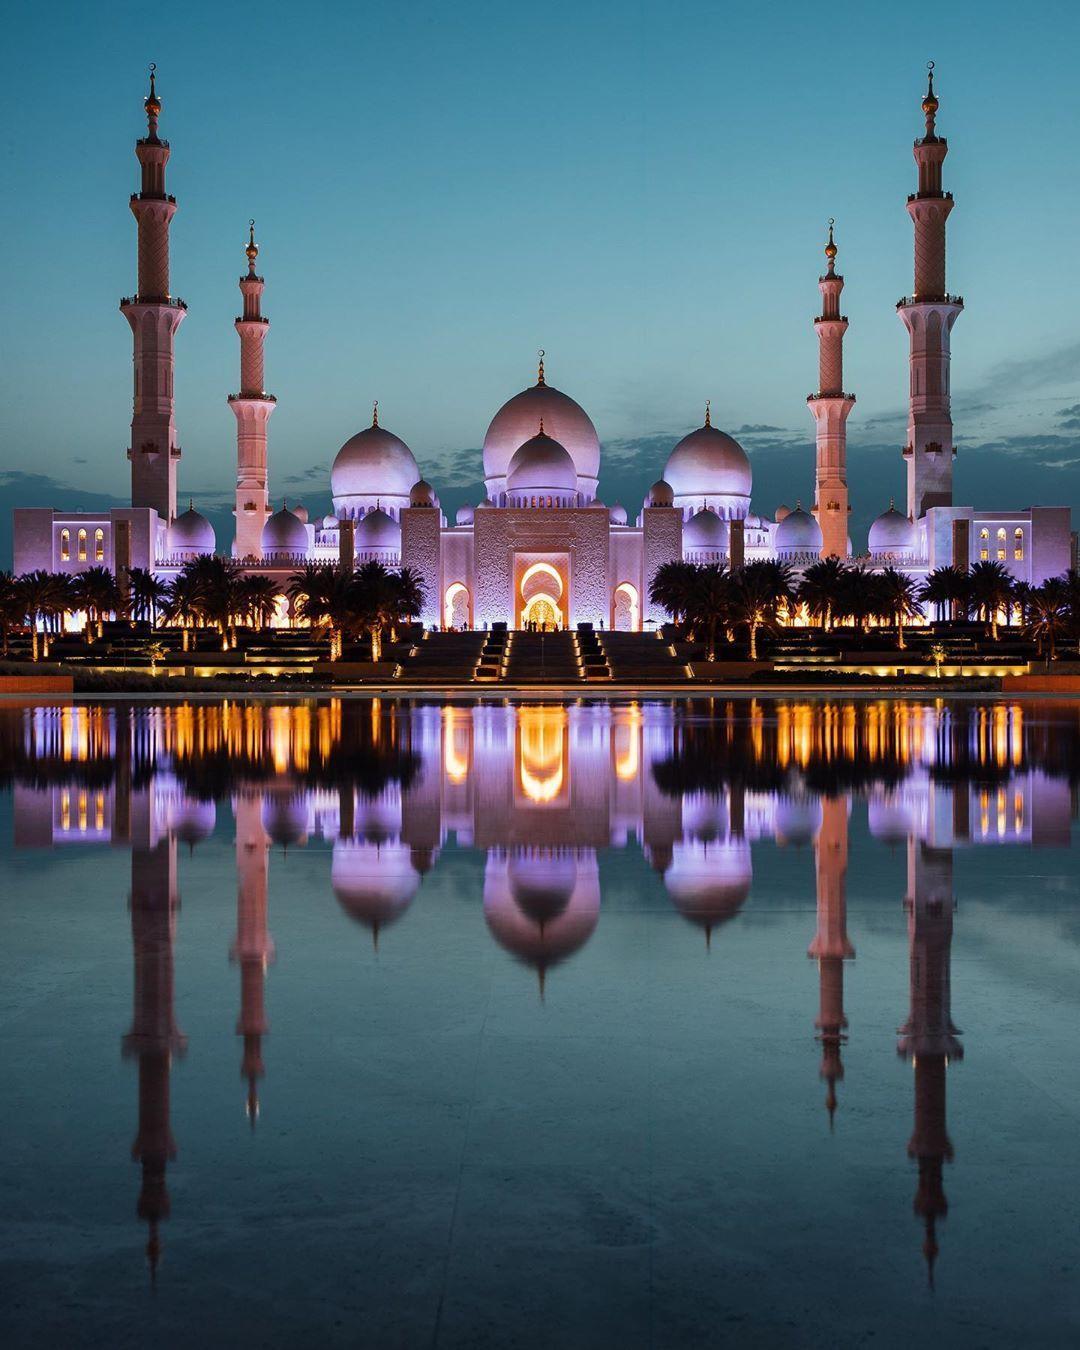 Abu Dhabi, United Arab Emirates Grand mosque, Sheikh